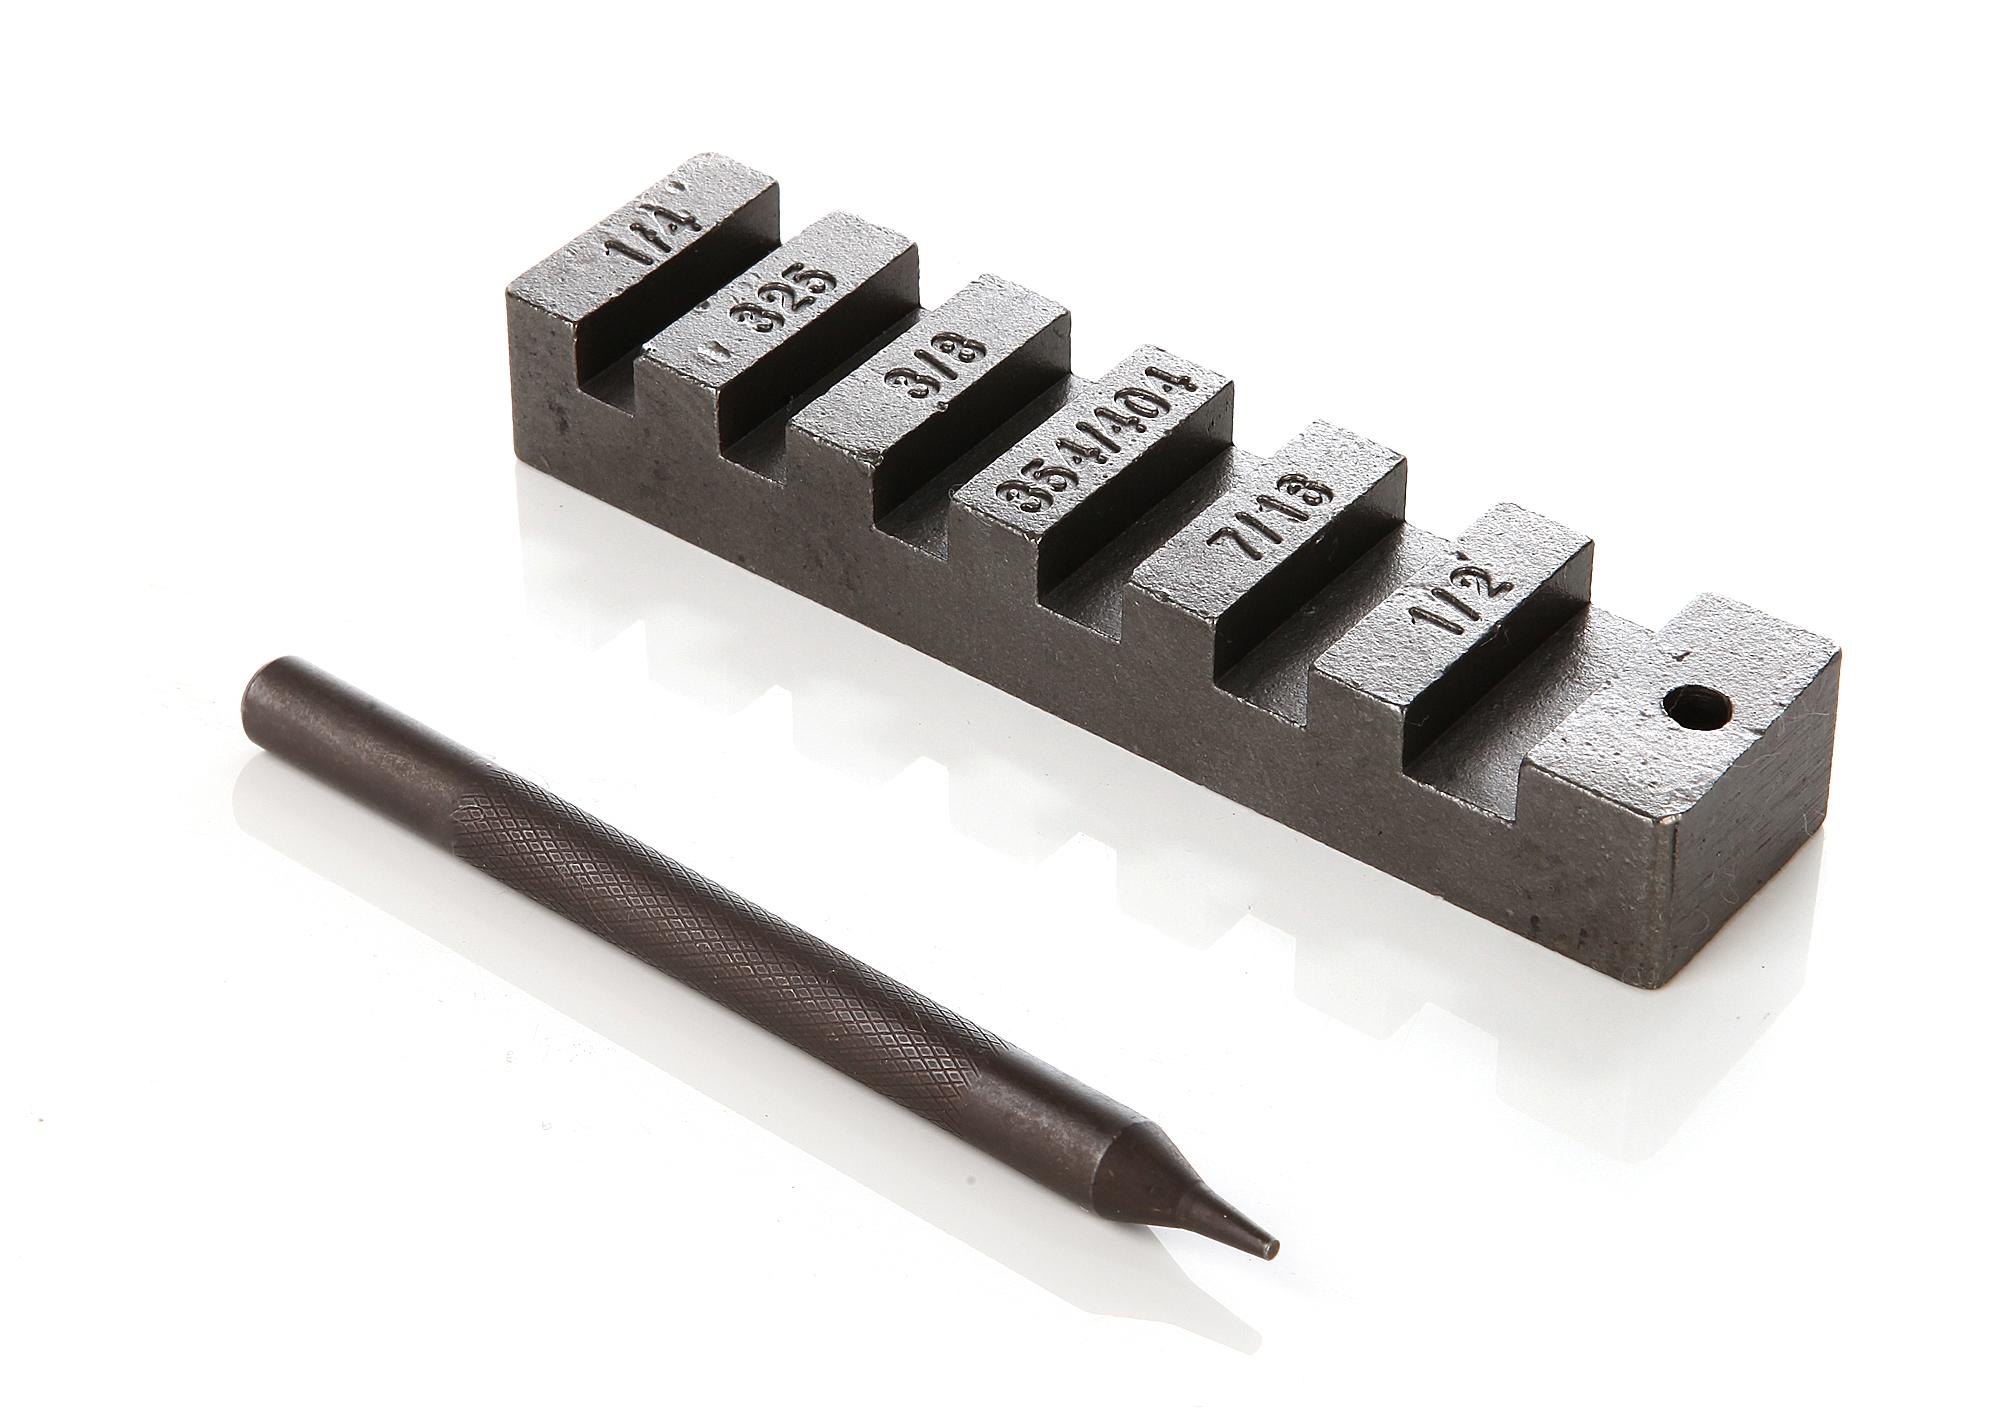 Chinese pocket Chain Breaker Manufacturer